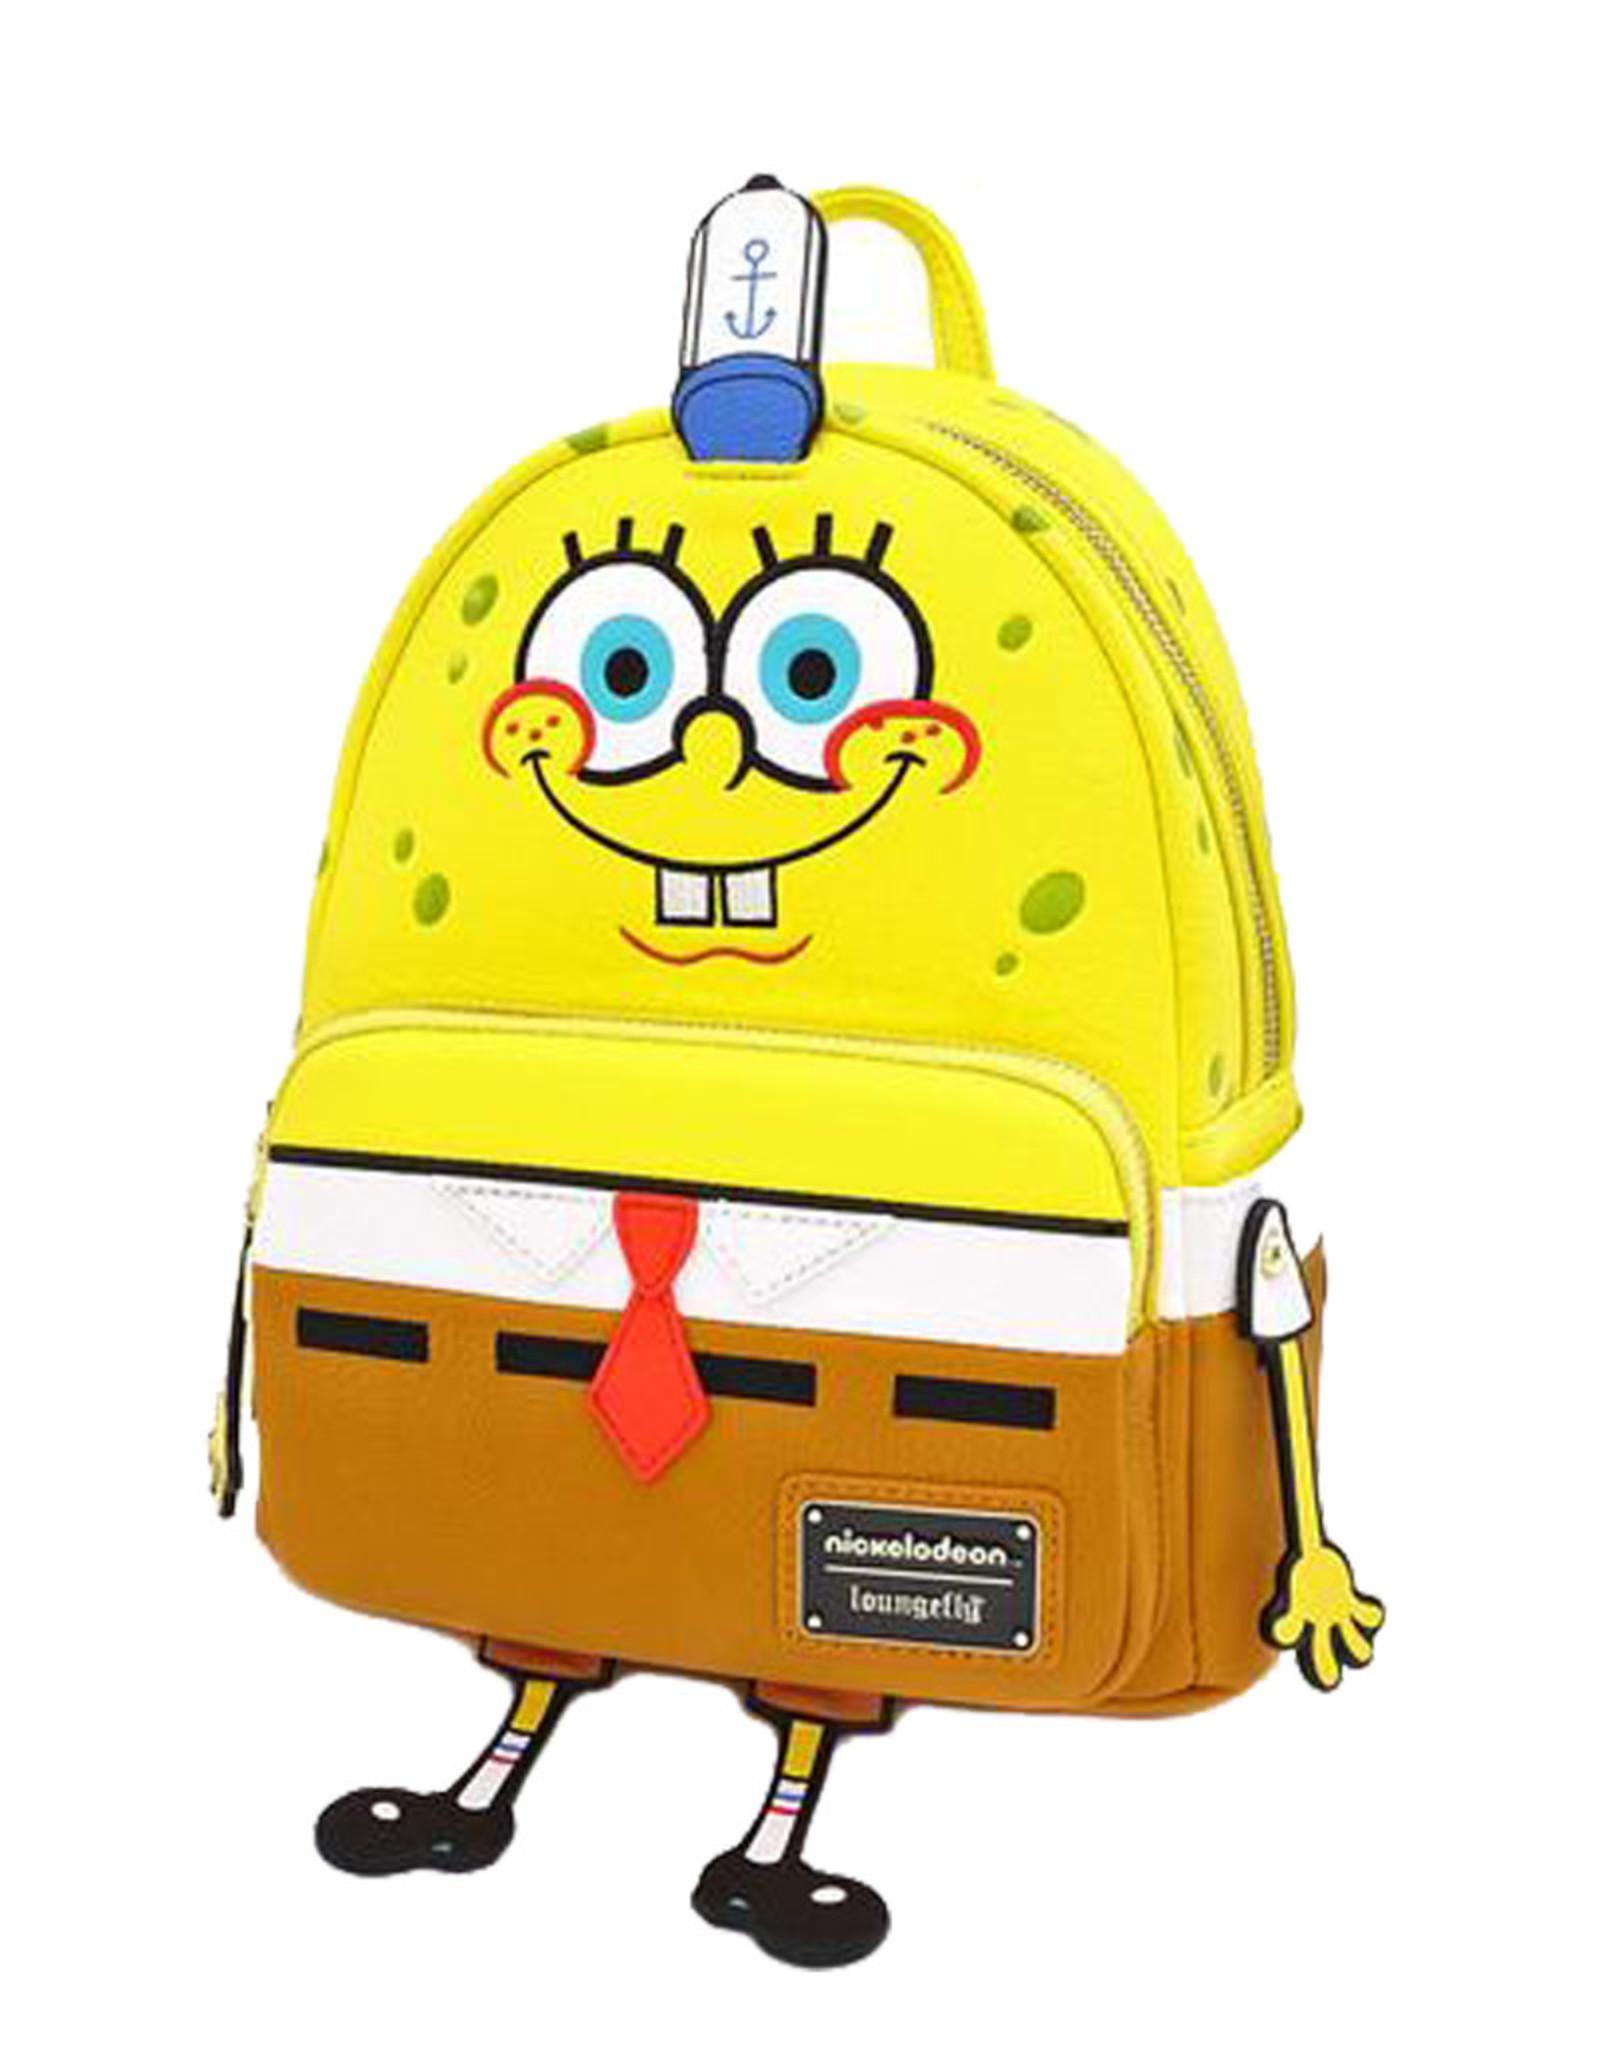 Nickelodeon ( Loungefly Mini Backpack ) Sponge Bob